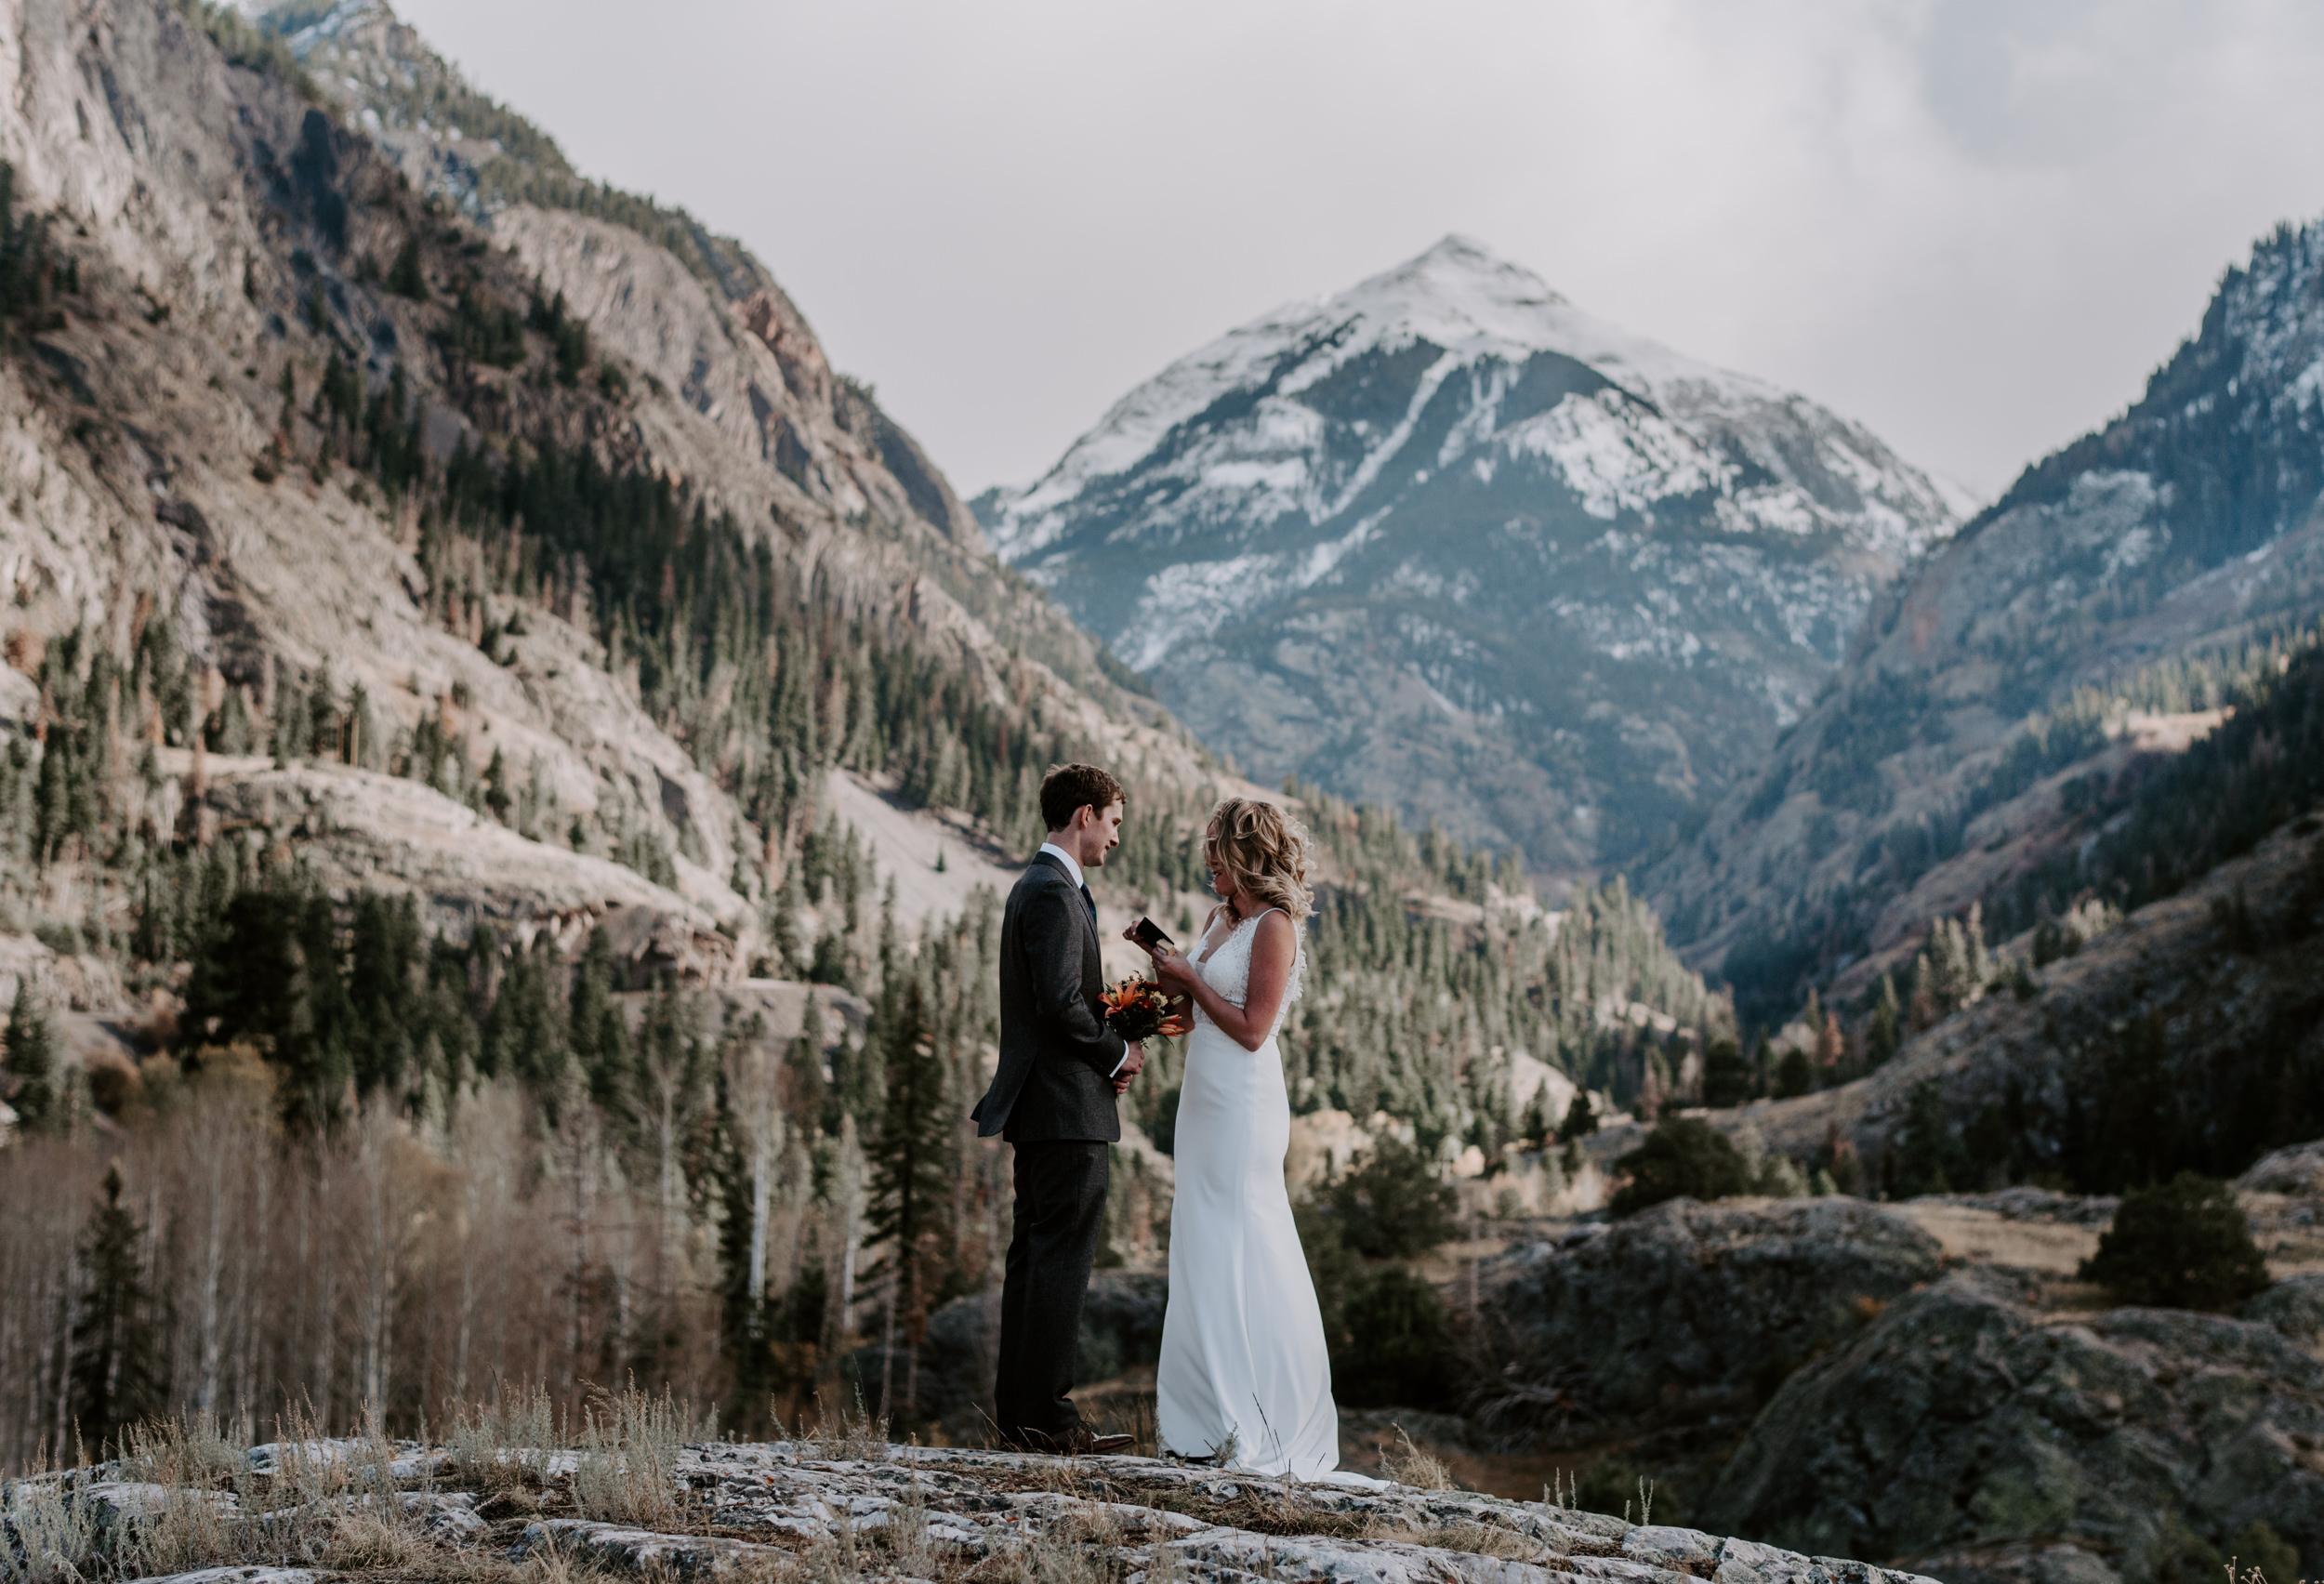 Elopement ceremony in Colorado. Colorado elopement photographer. Ouray intimate wedding.